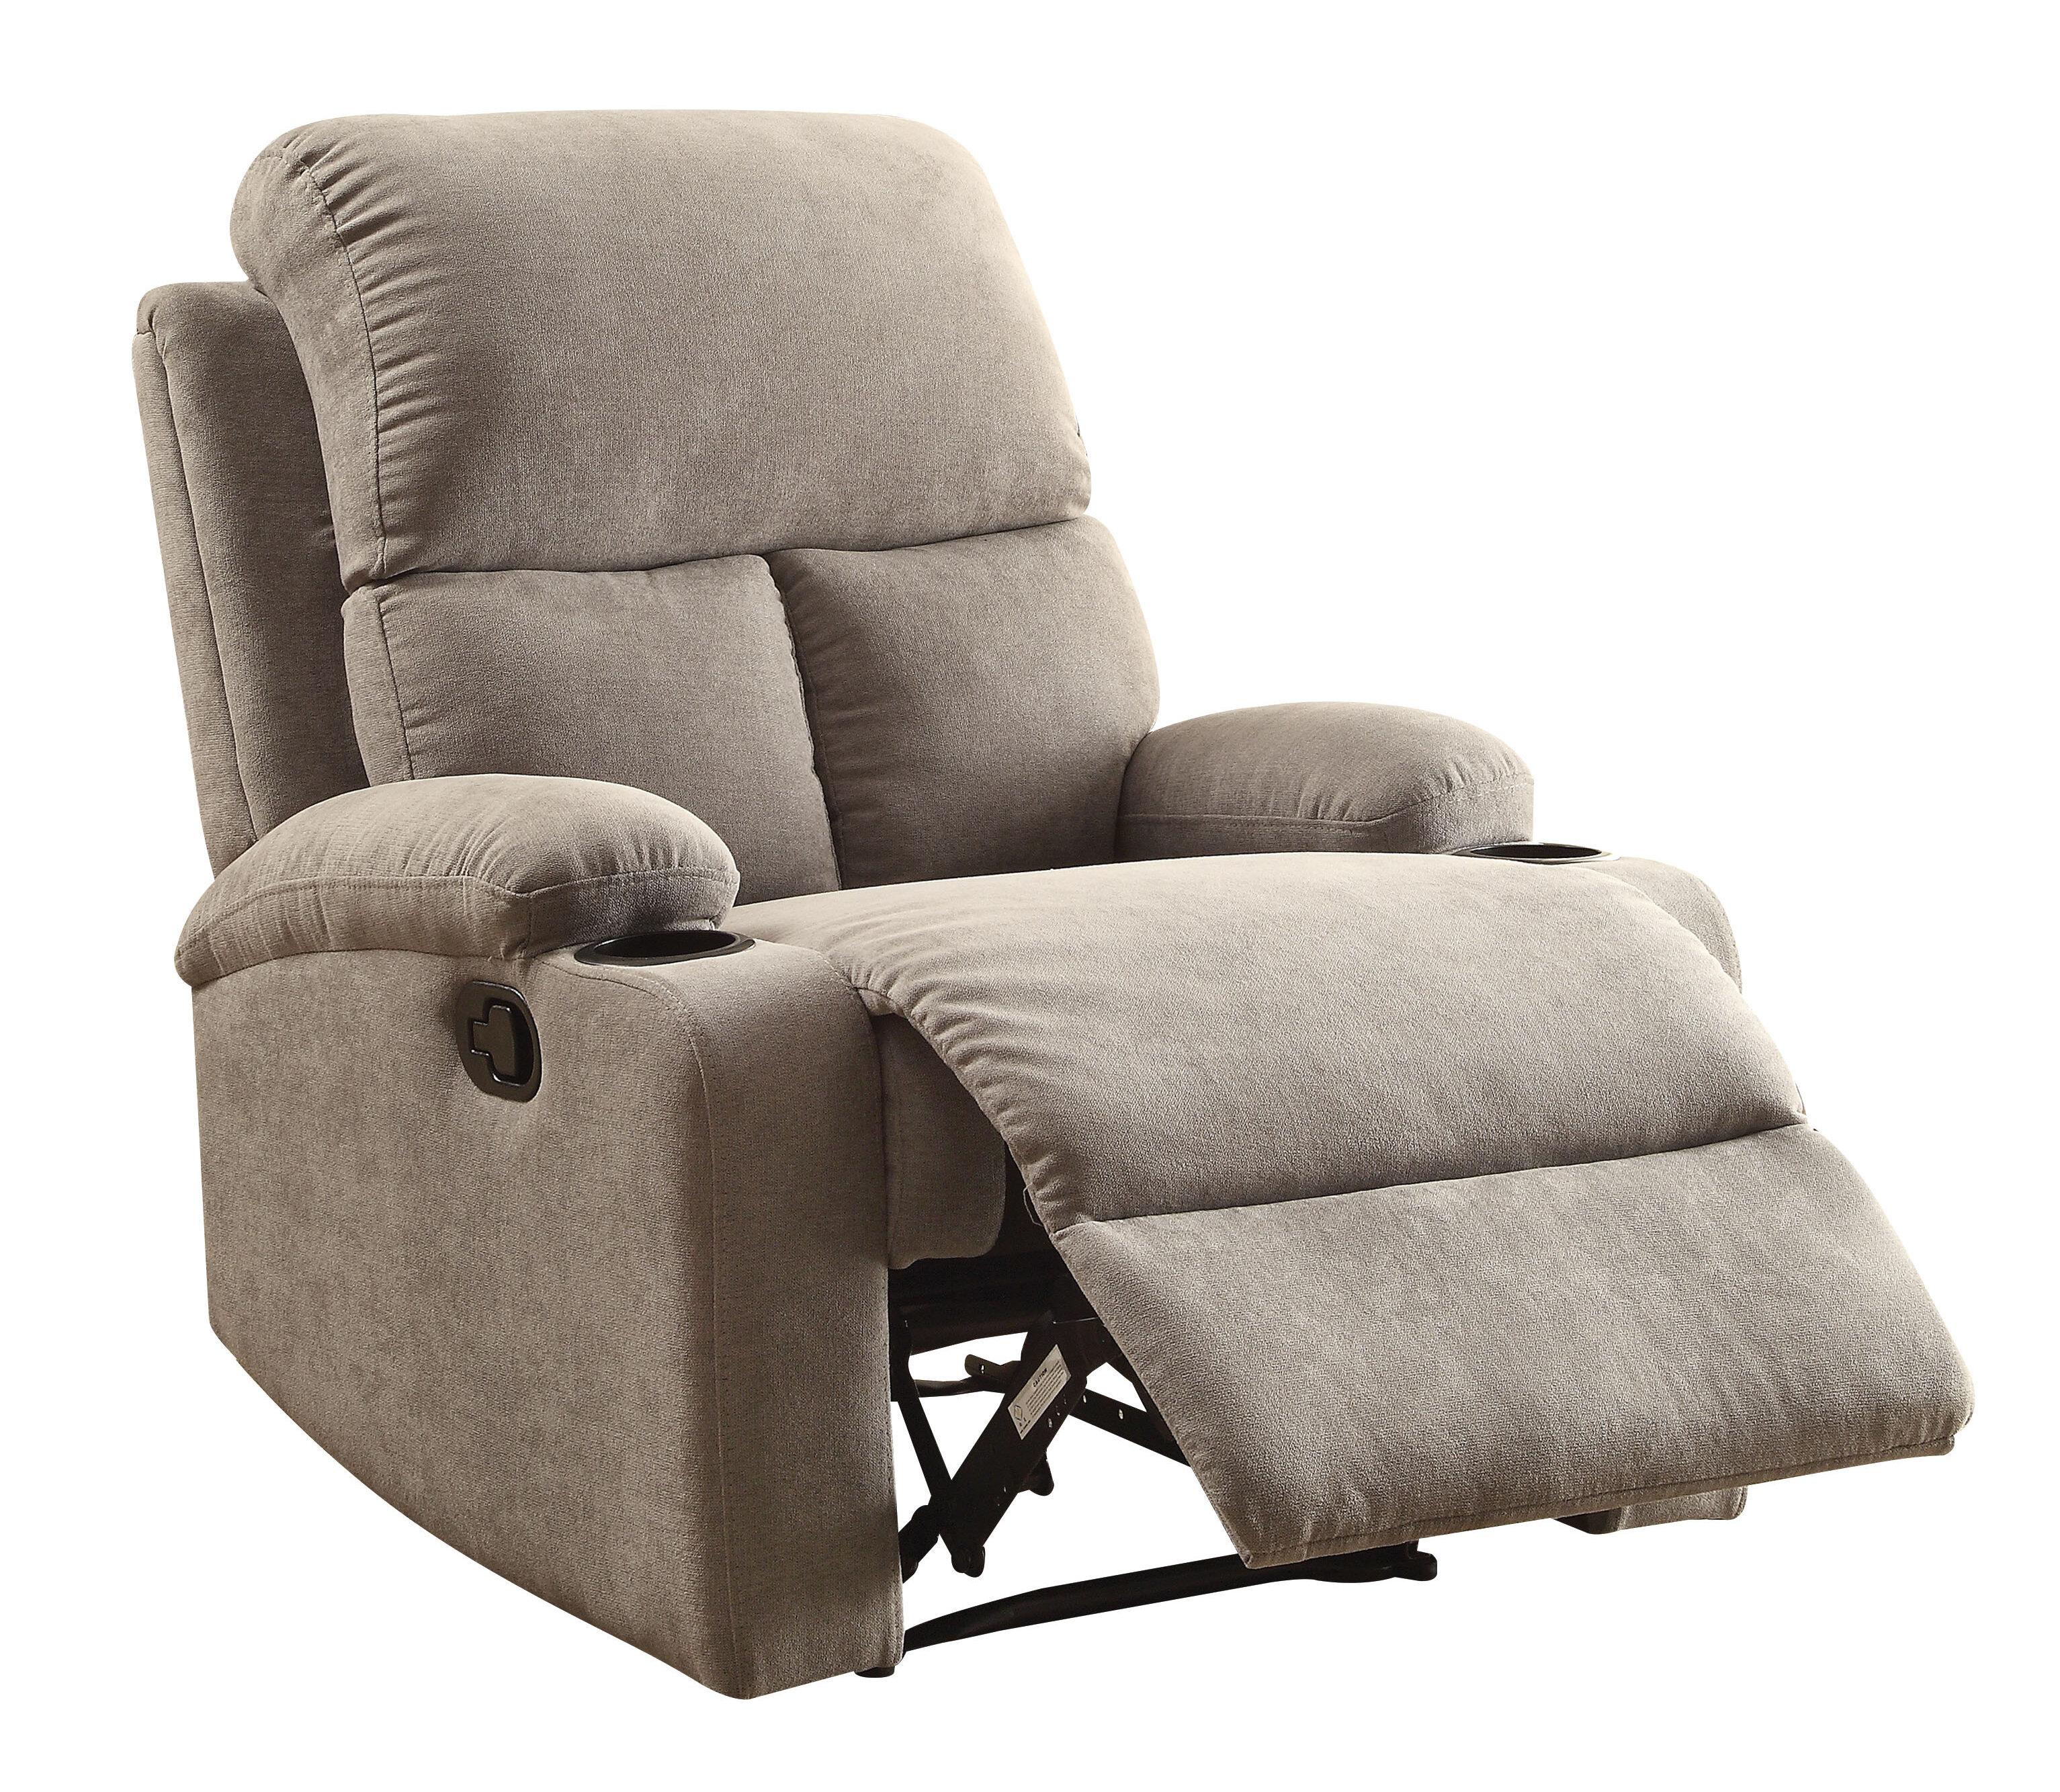 Strange Winston Porter Rockmart Manual Recliner Reviews Wayfair Spiritservingveterans Wood Chair Design Ideas Spiritservingveteransorg